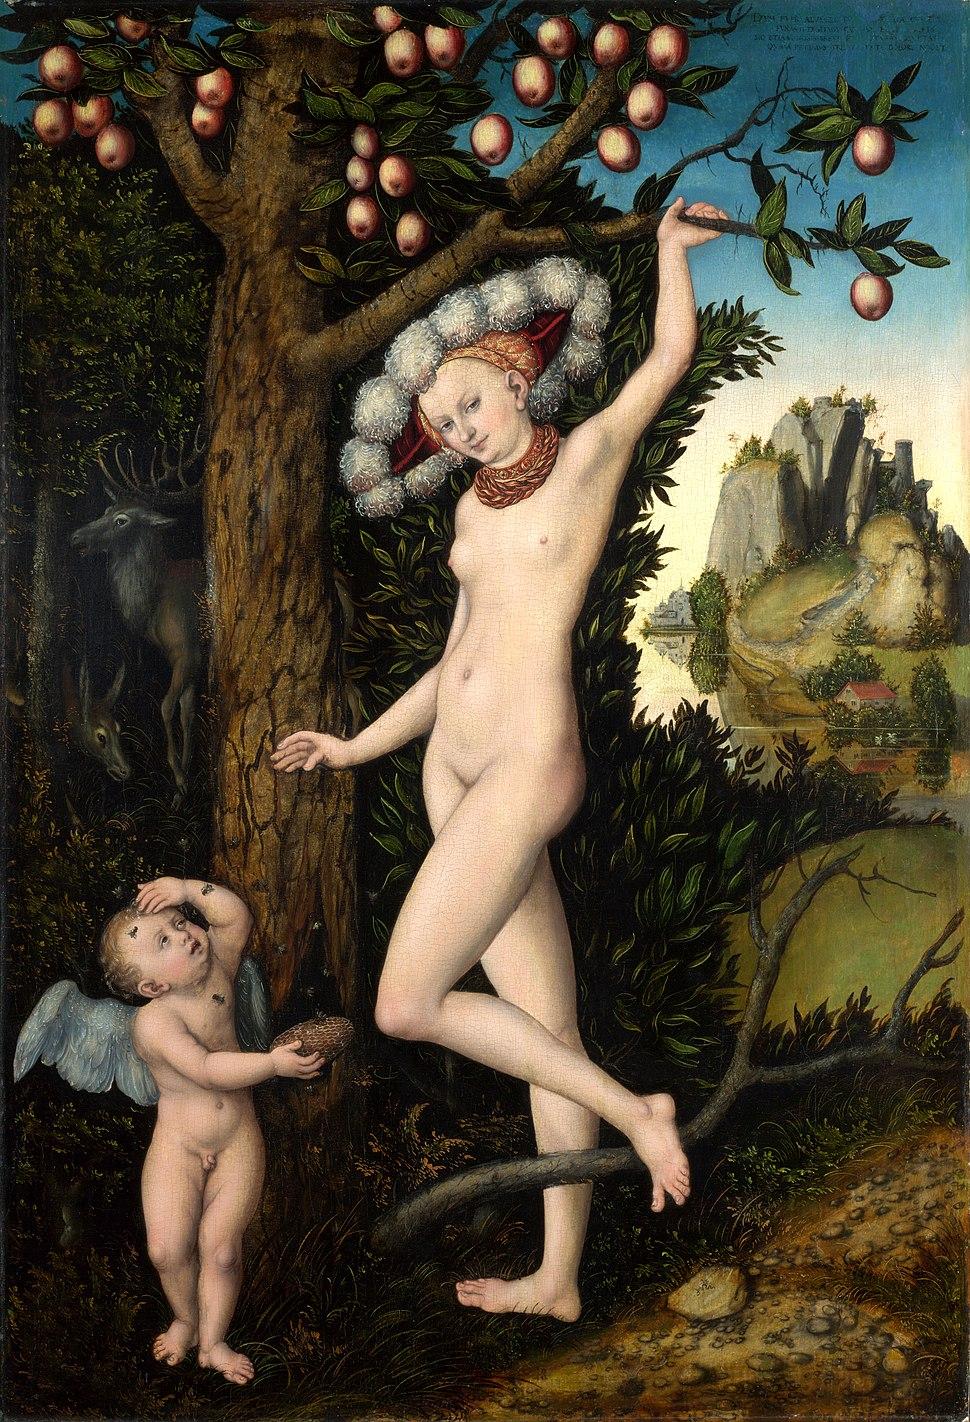 Lucas Cranach d.%C3%84. - Amor beklagt sich bei Venus (National Gallery, London).jpg